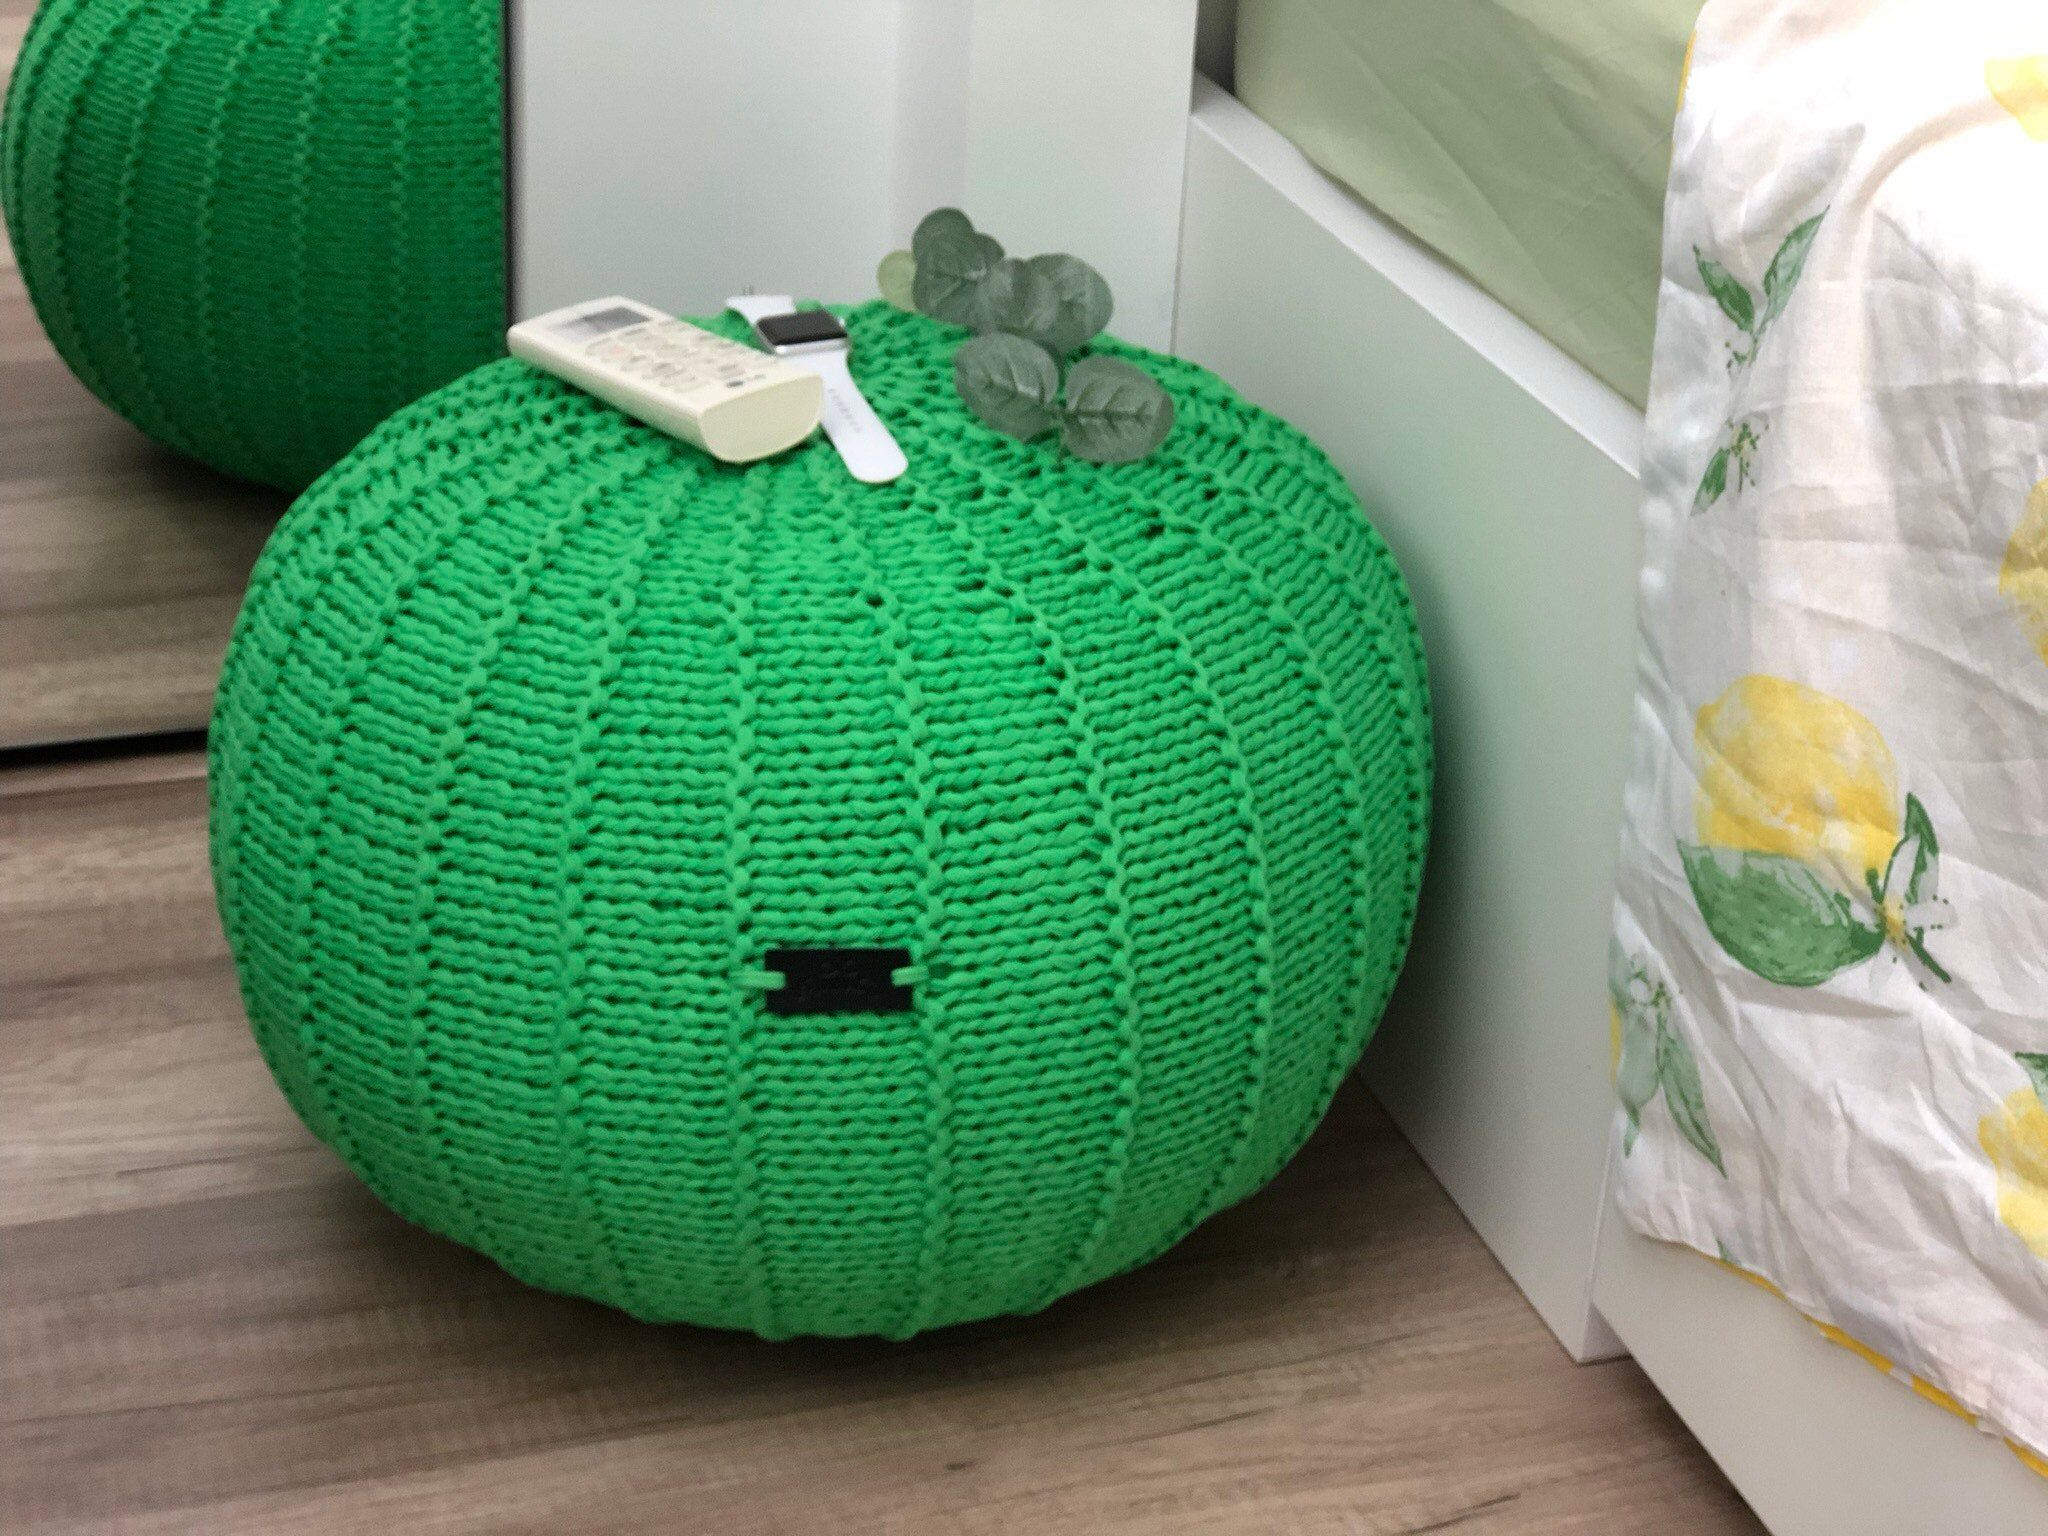 Knit pouf ottoman, Green pouf Knitted footstool Knitted floor pouf Green ottoman, #Floor #Footstool #green #Knit #Knitted #Ottoman #Pouf